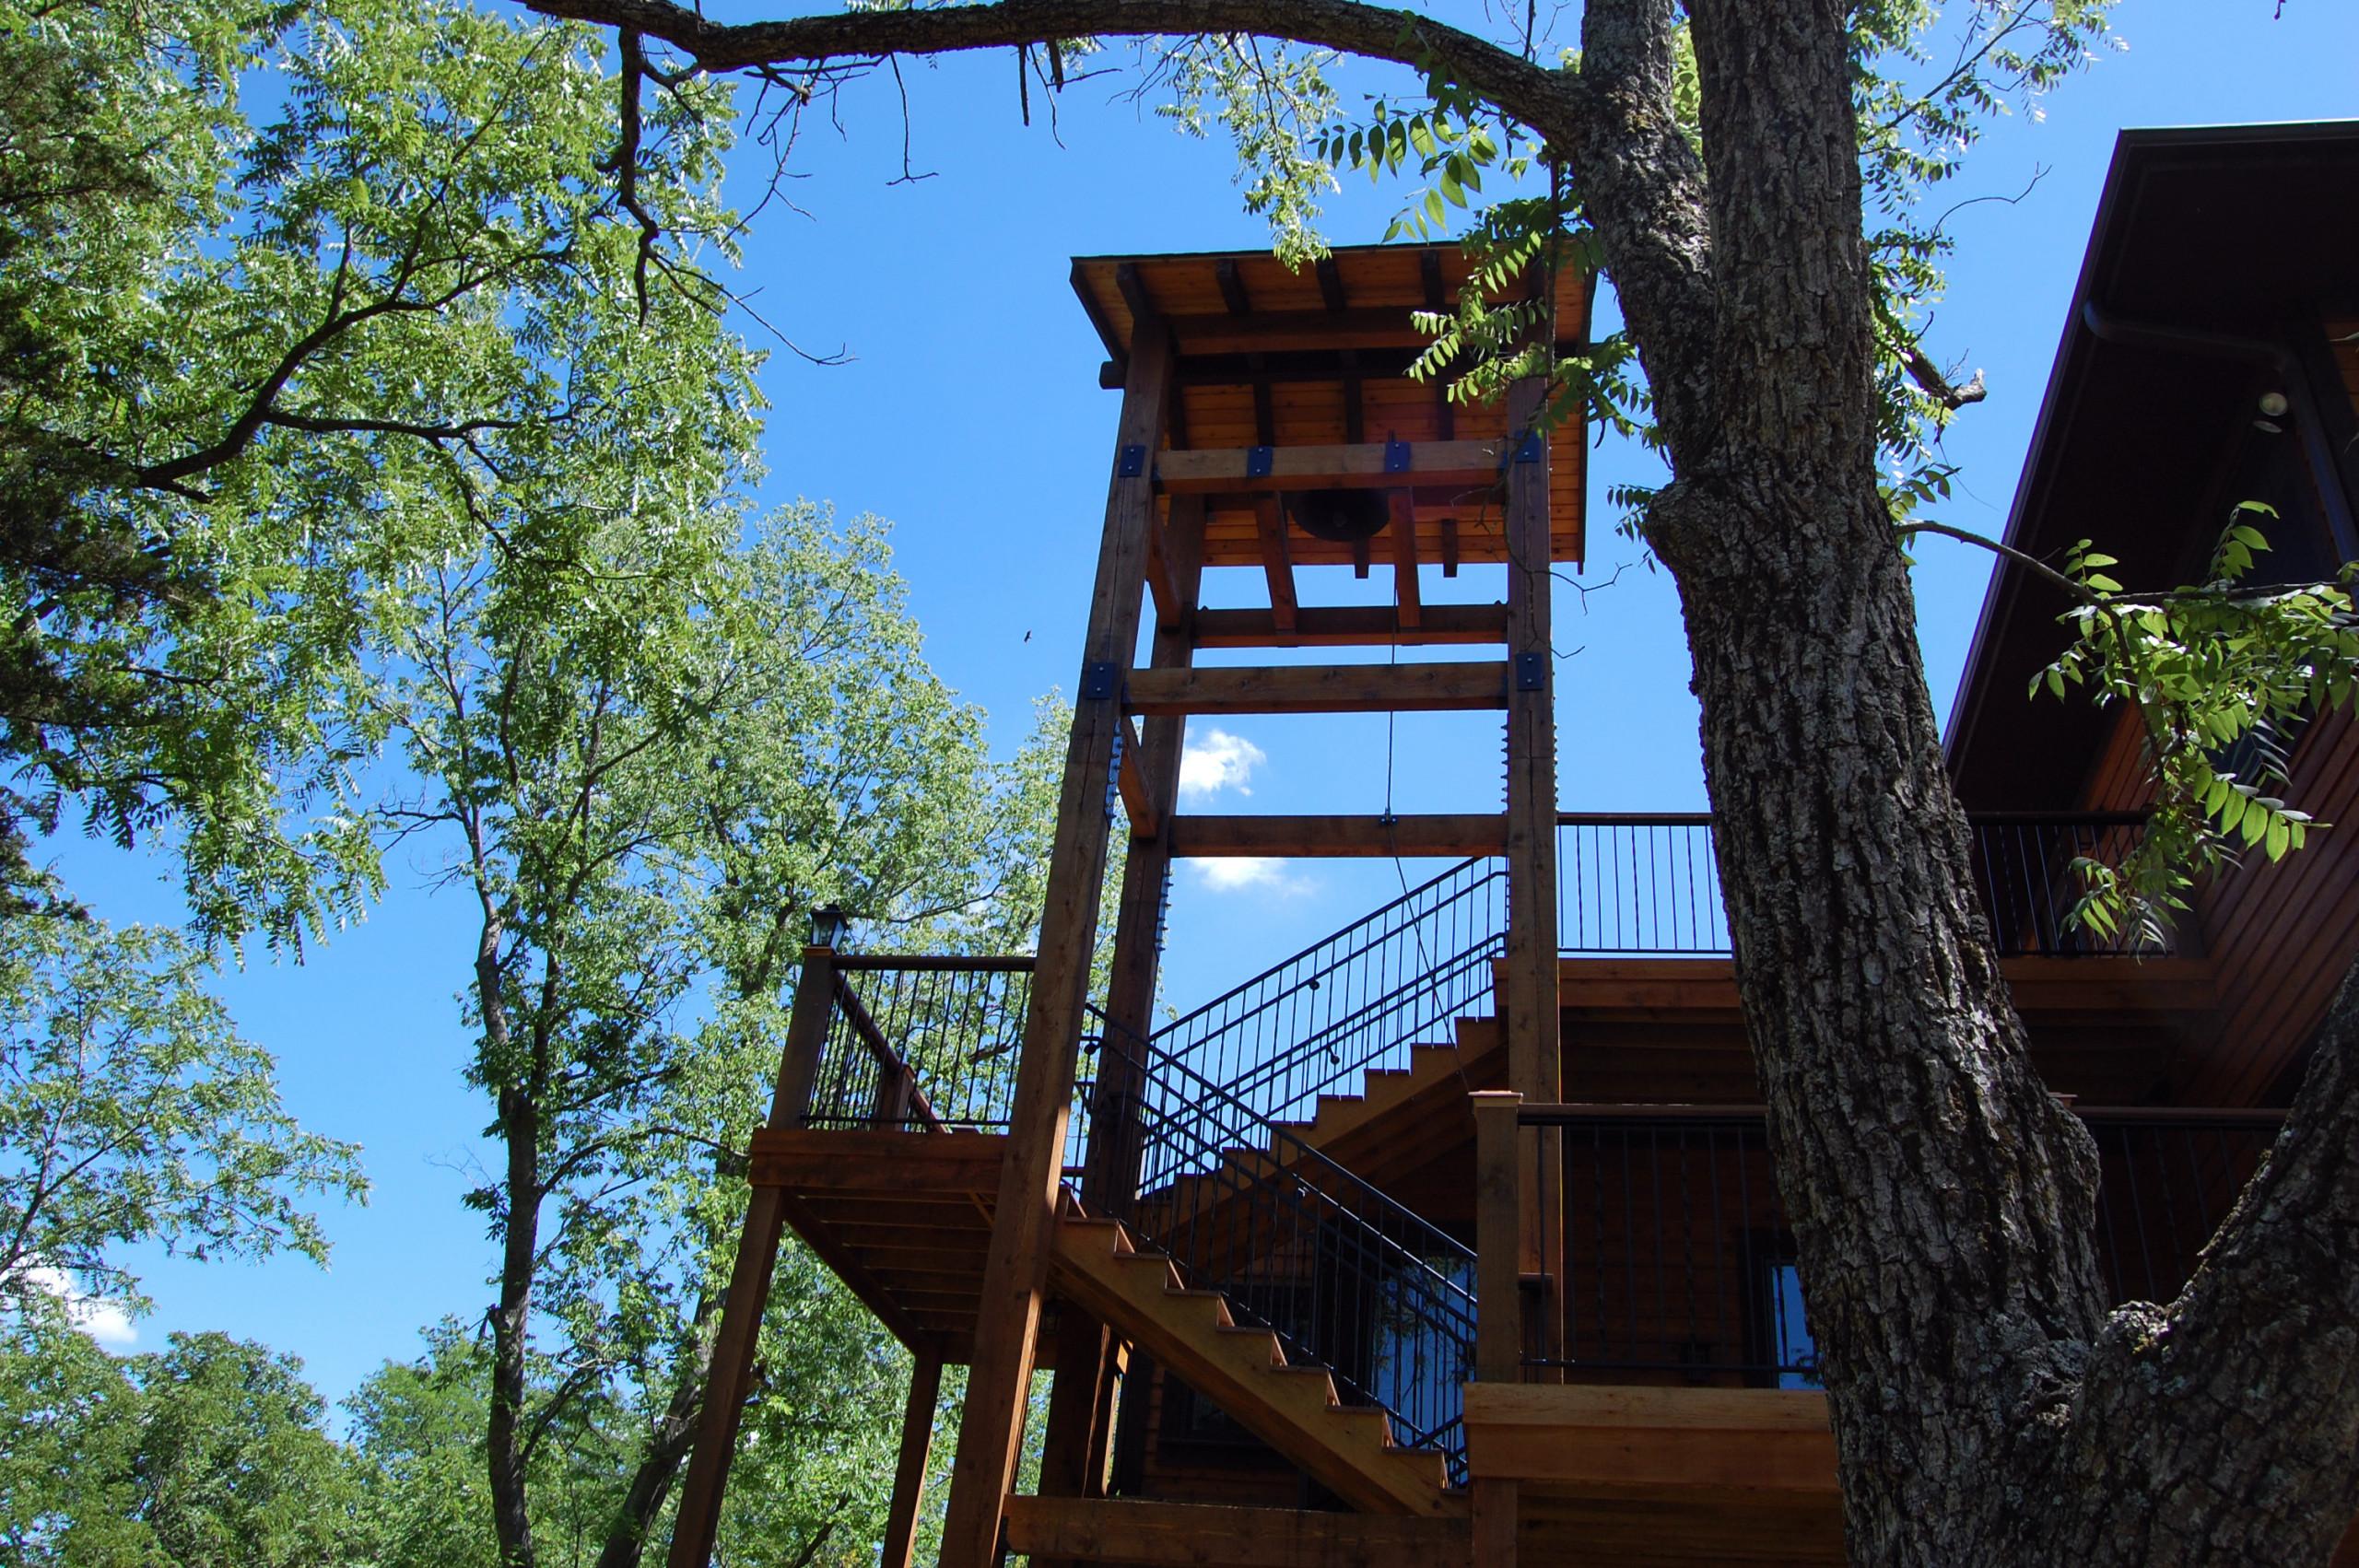 Timber Creek Finish